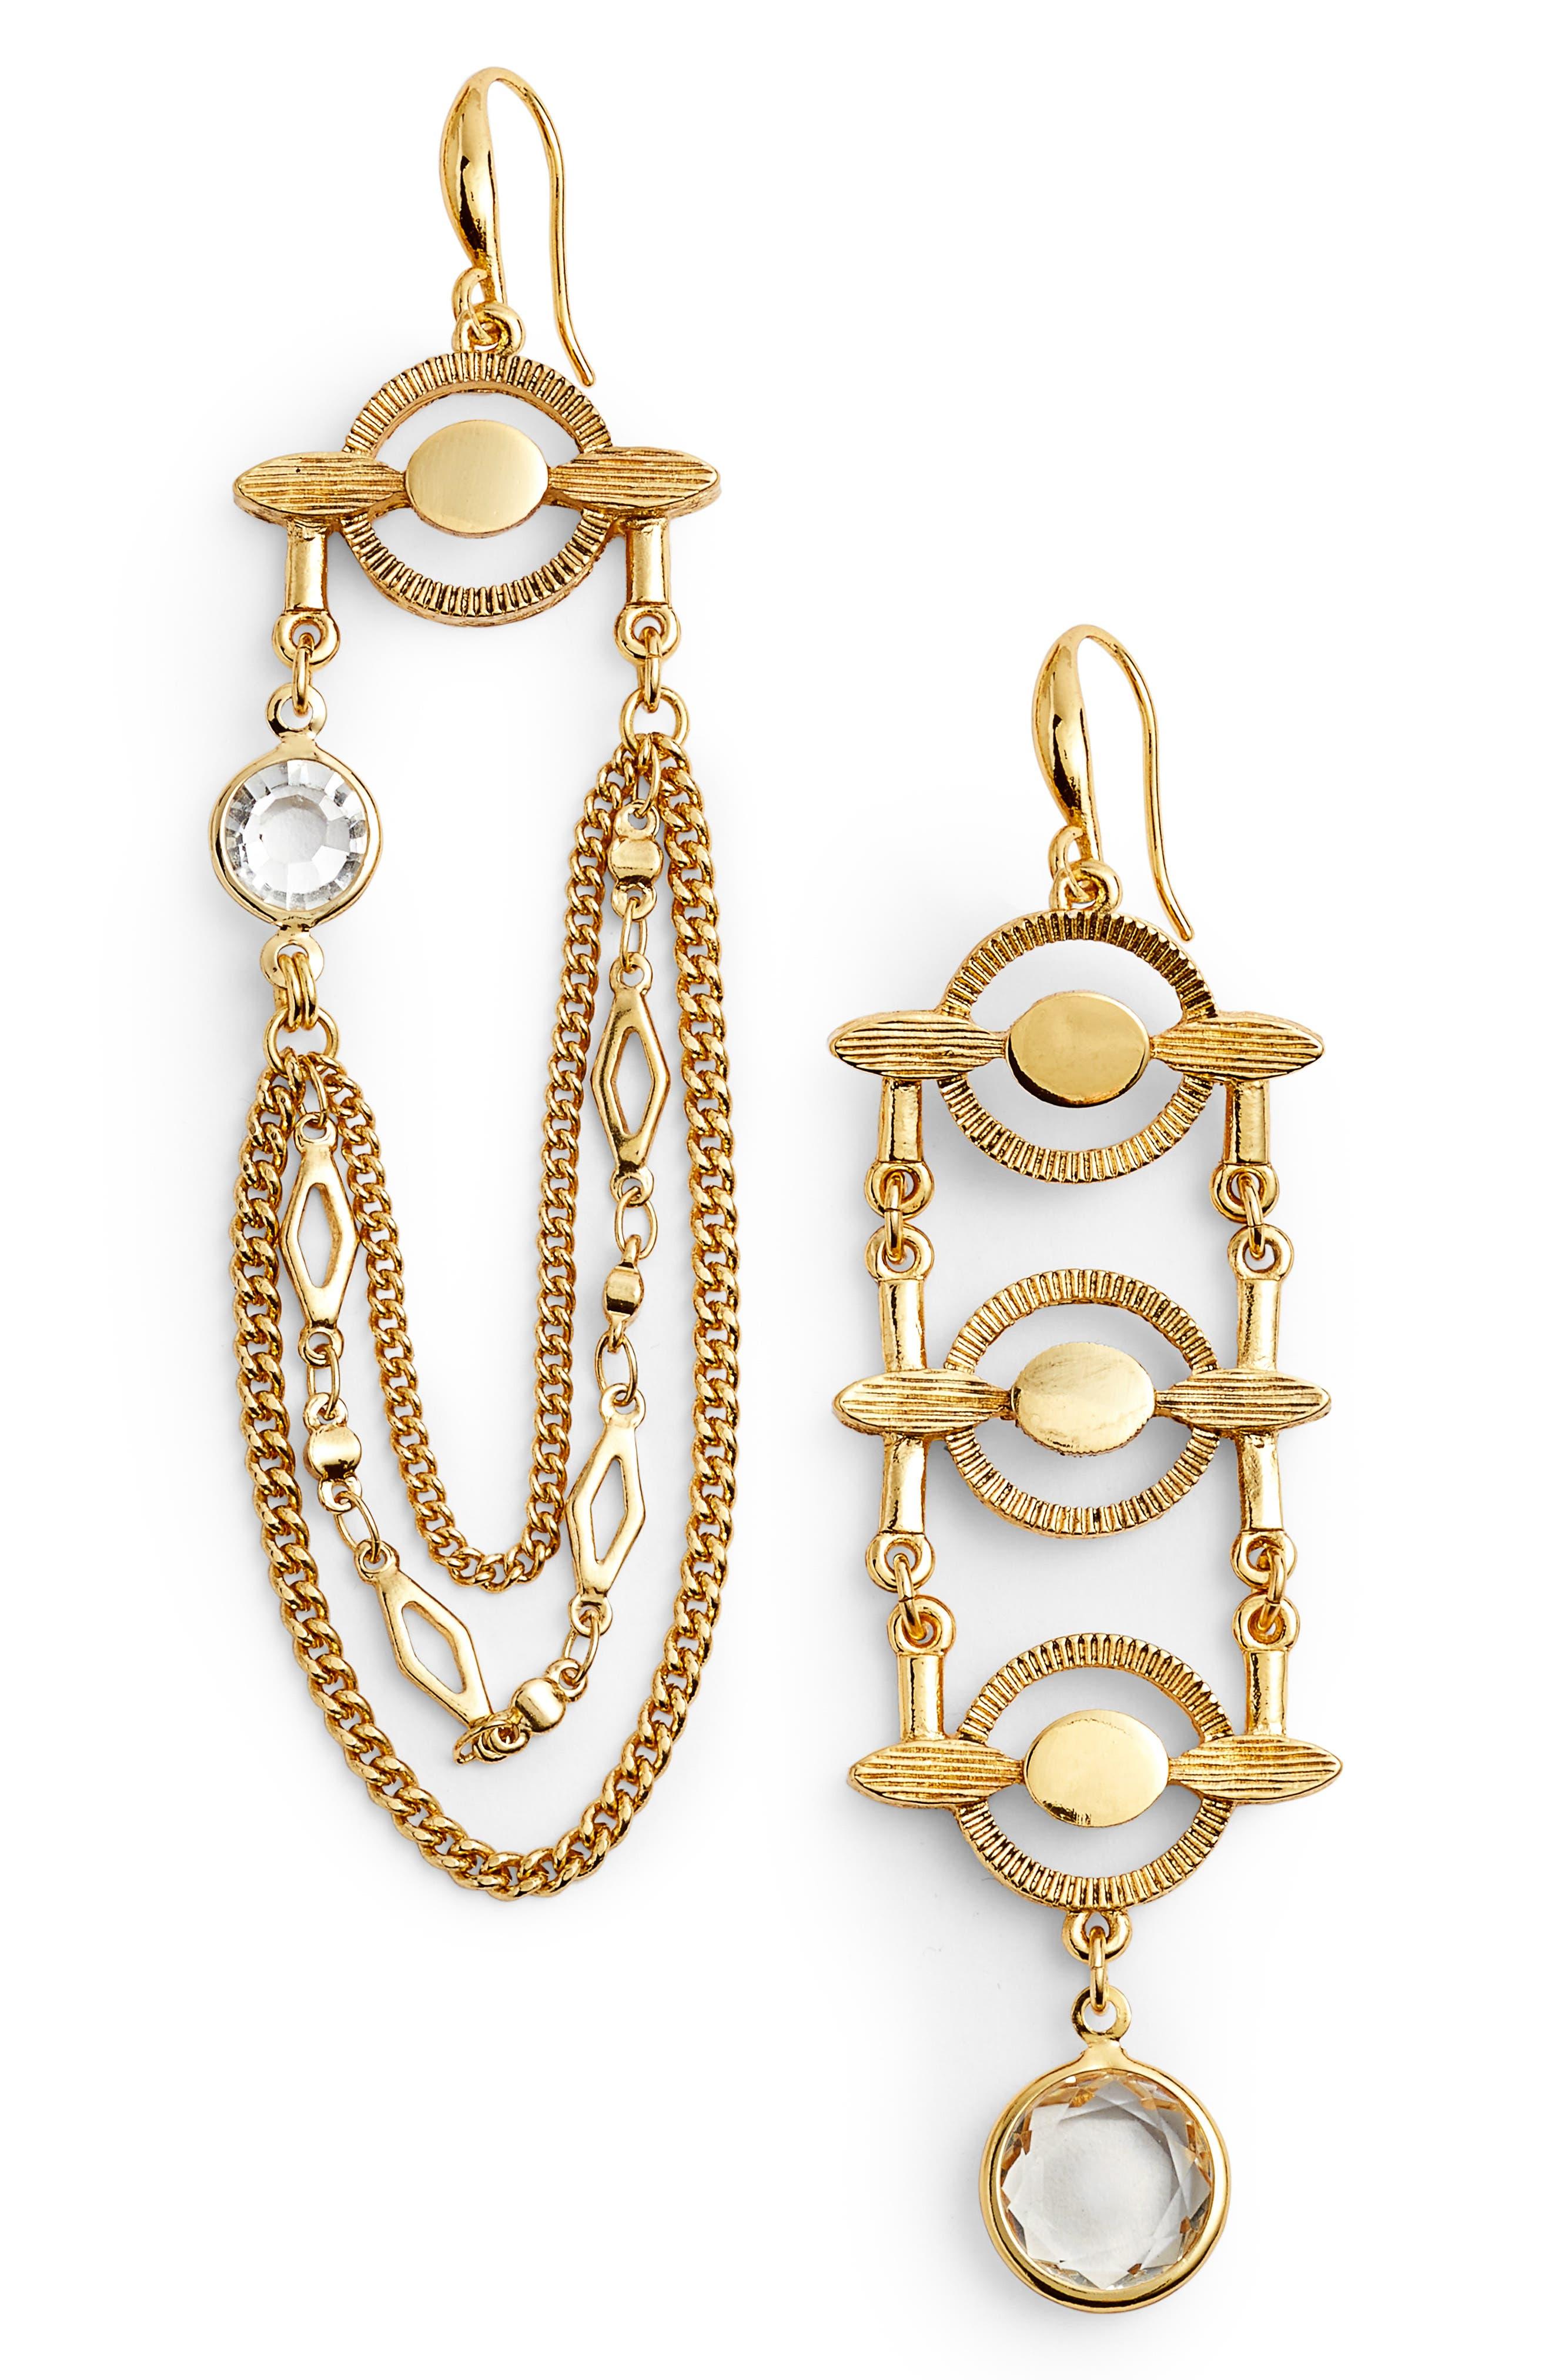 Badgley Mischka Asymmetrical Drop Earrings,                             Main thumbnail 1, color,                             710